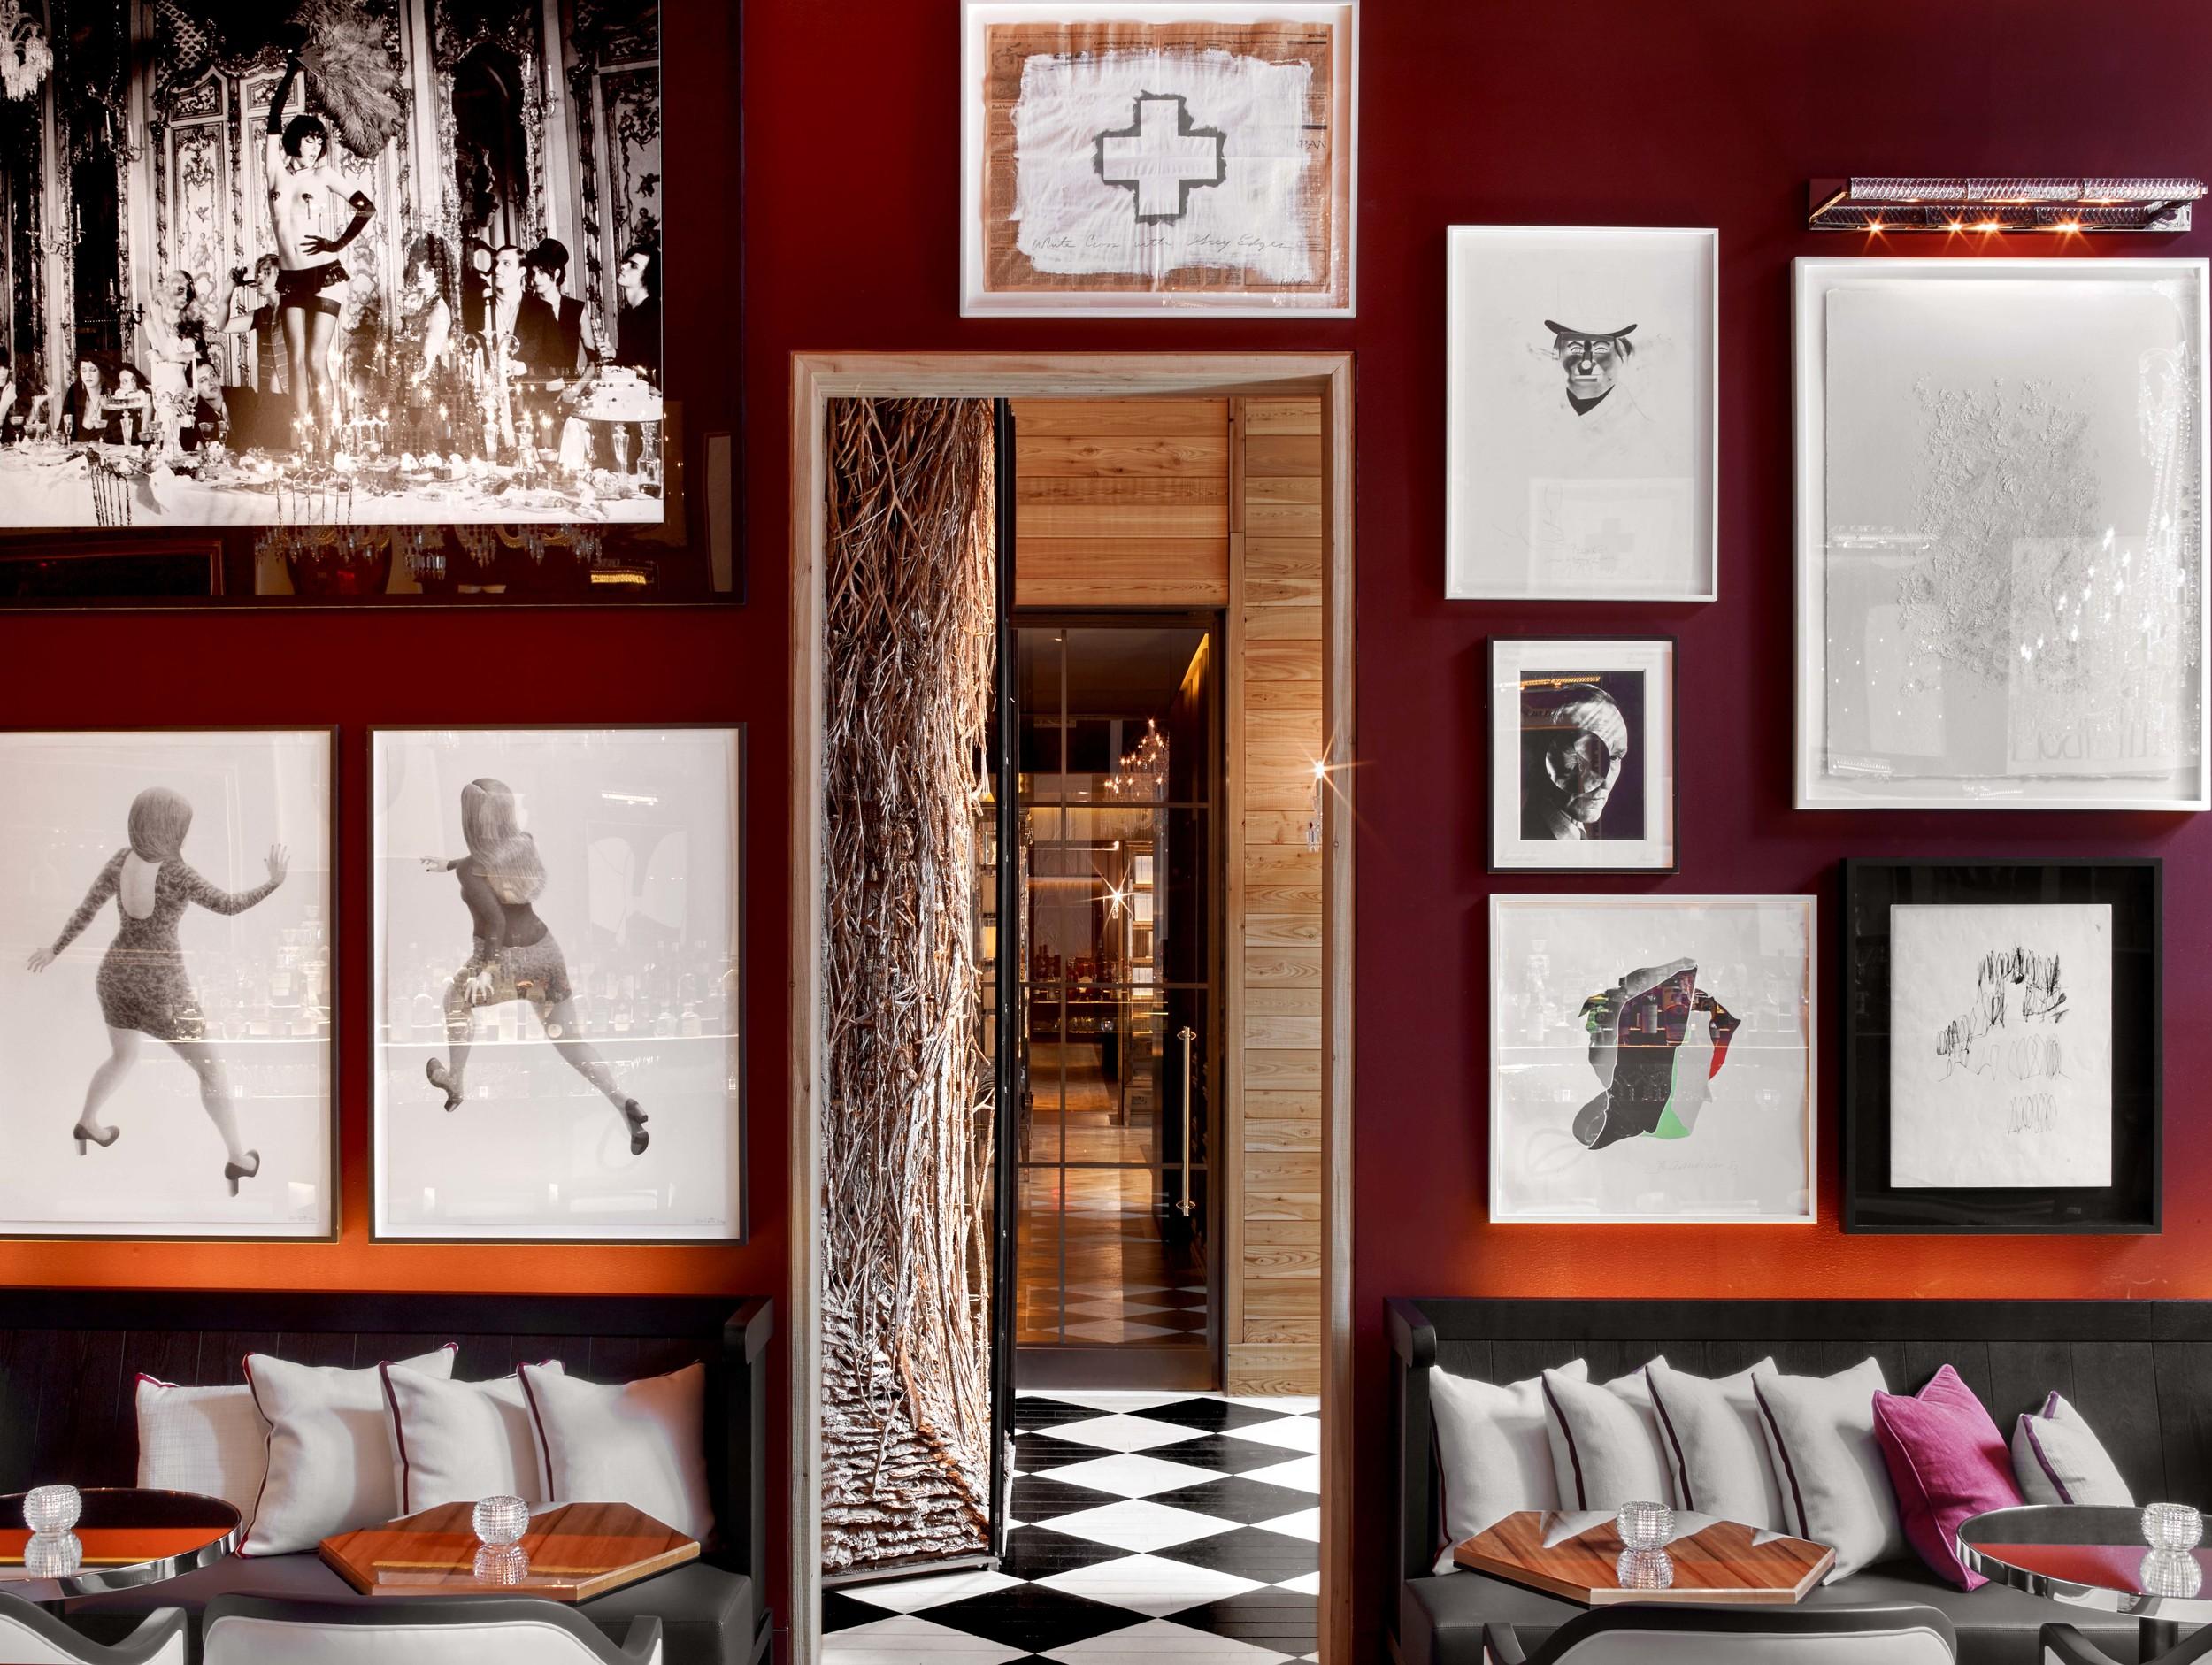 Baccarat Hotel & Residences New York_The Bar (3).jpg